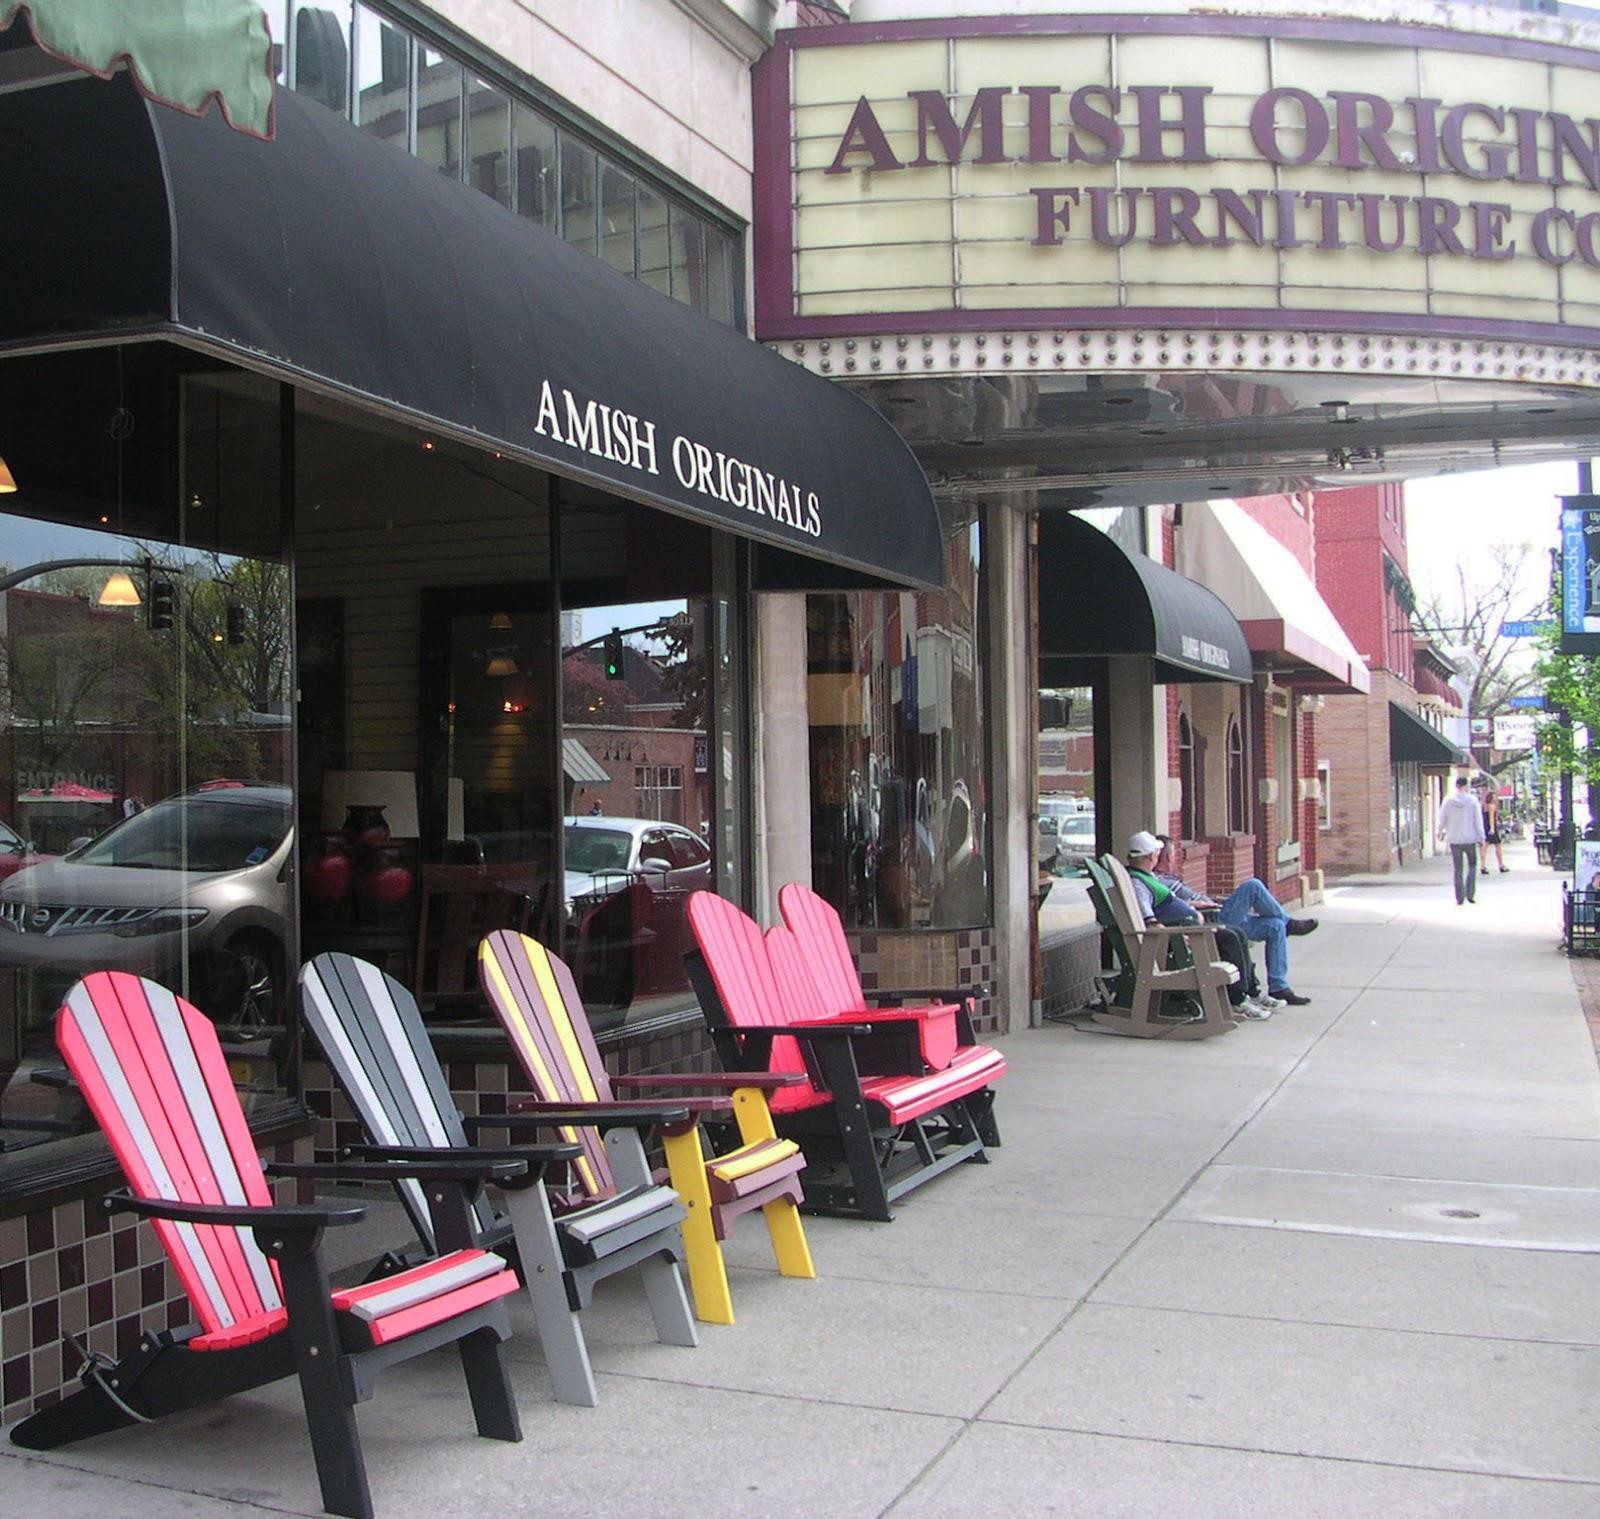 Amish Originals Furniture Co Signs Of Spring